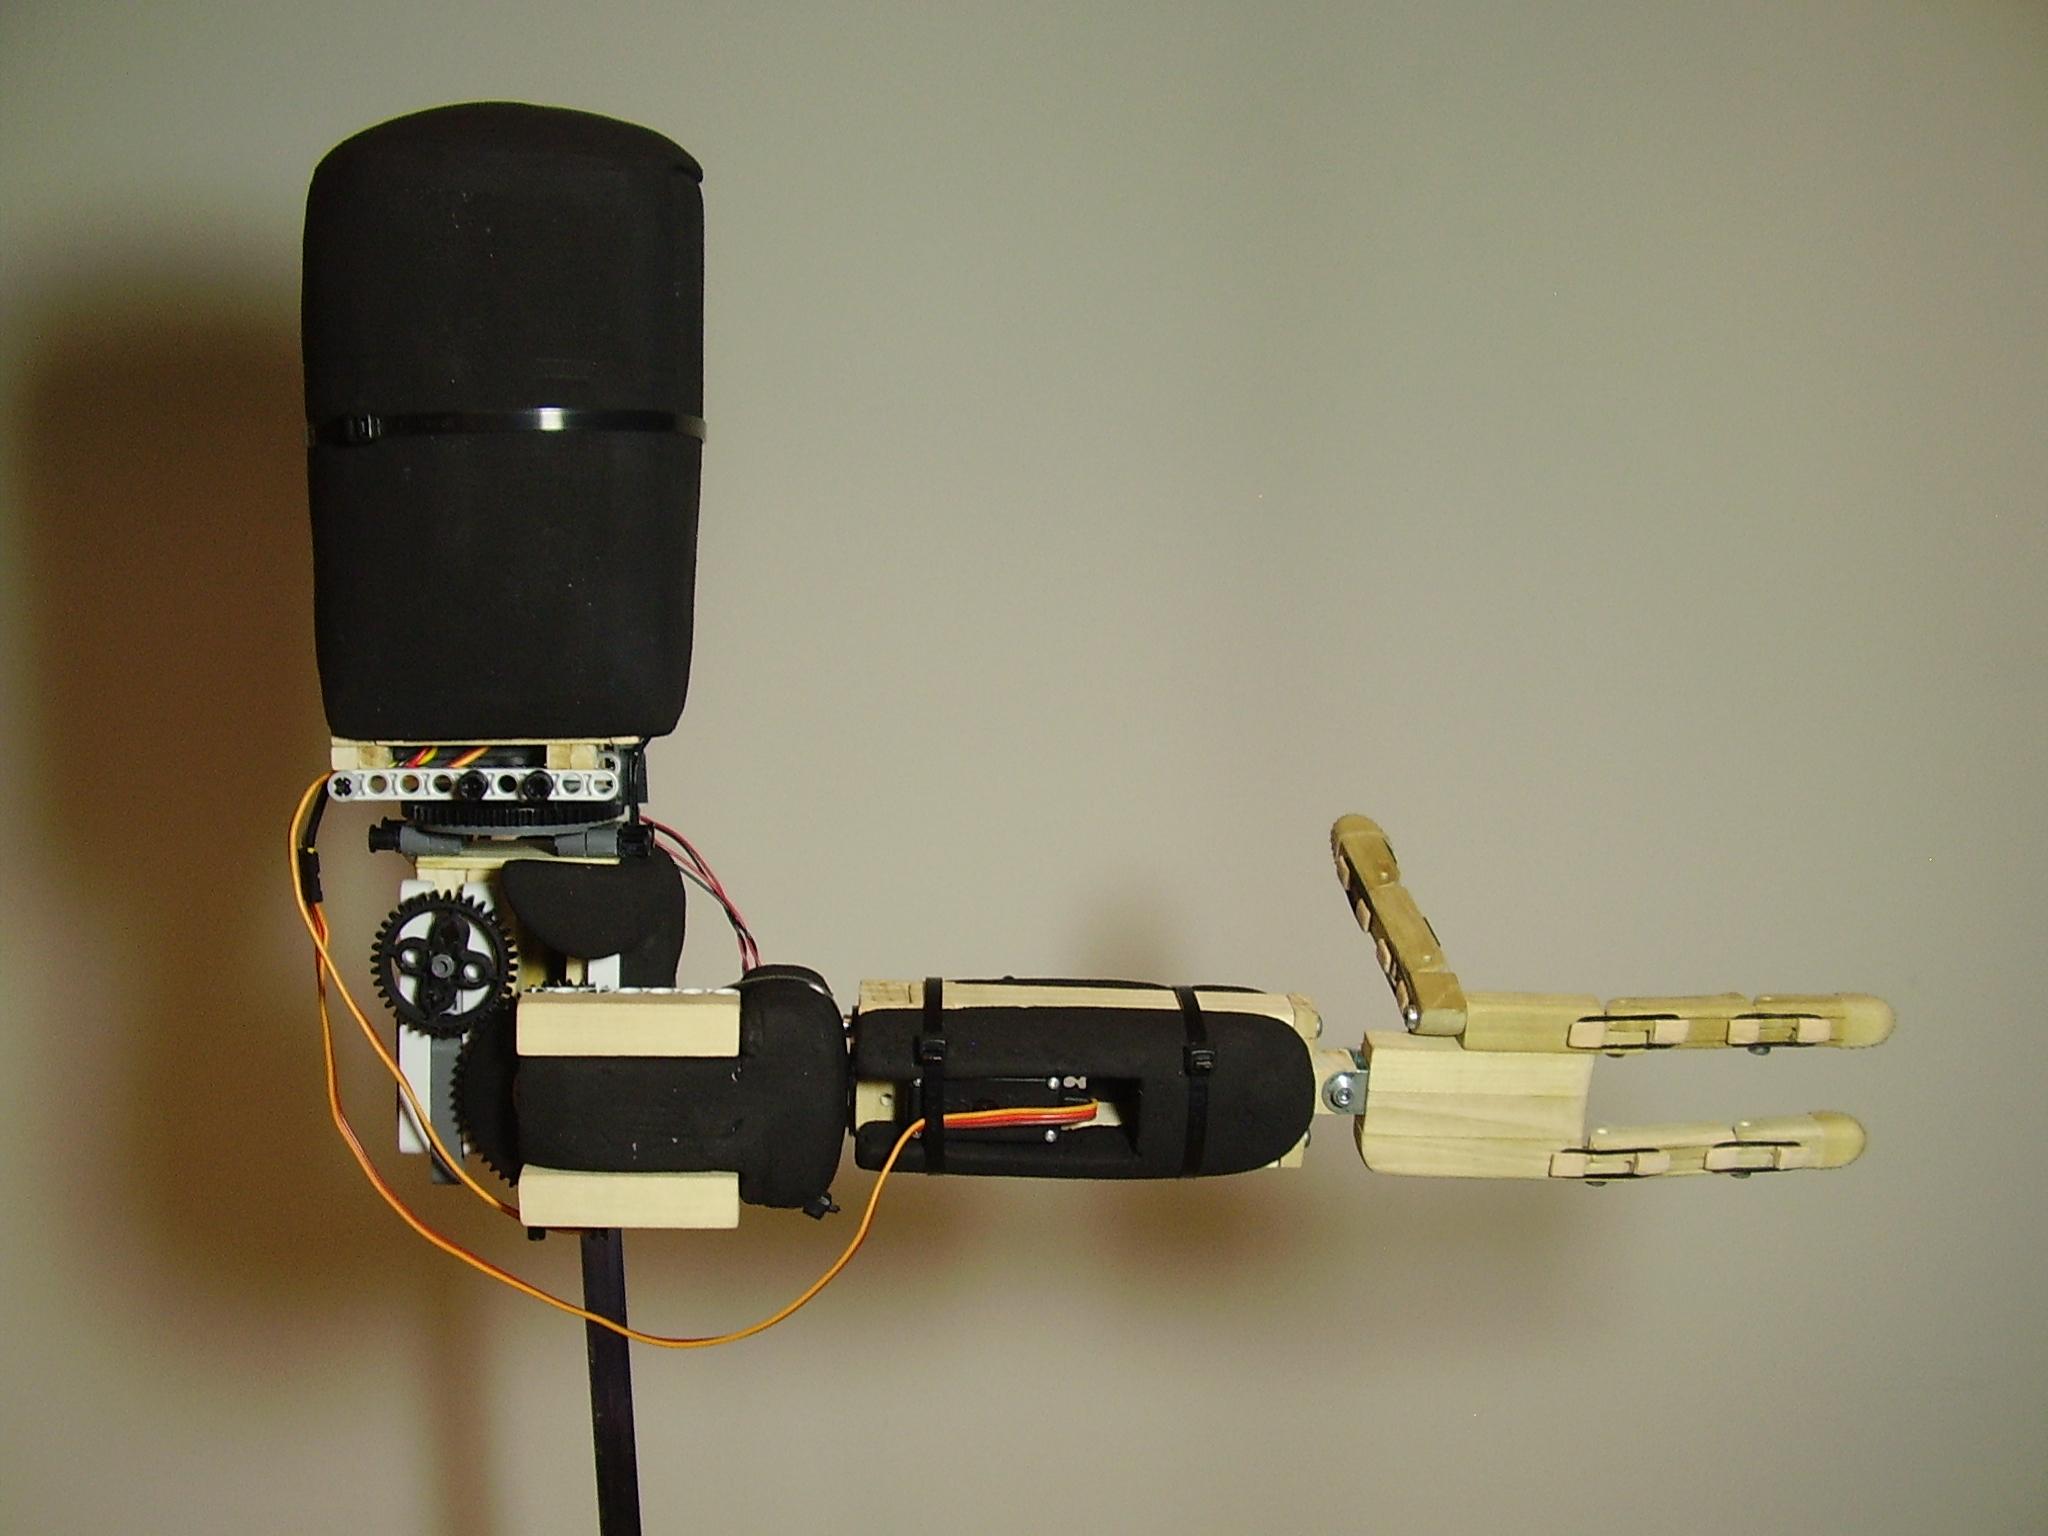 Picture of Arduino-based Robotic Manipulator